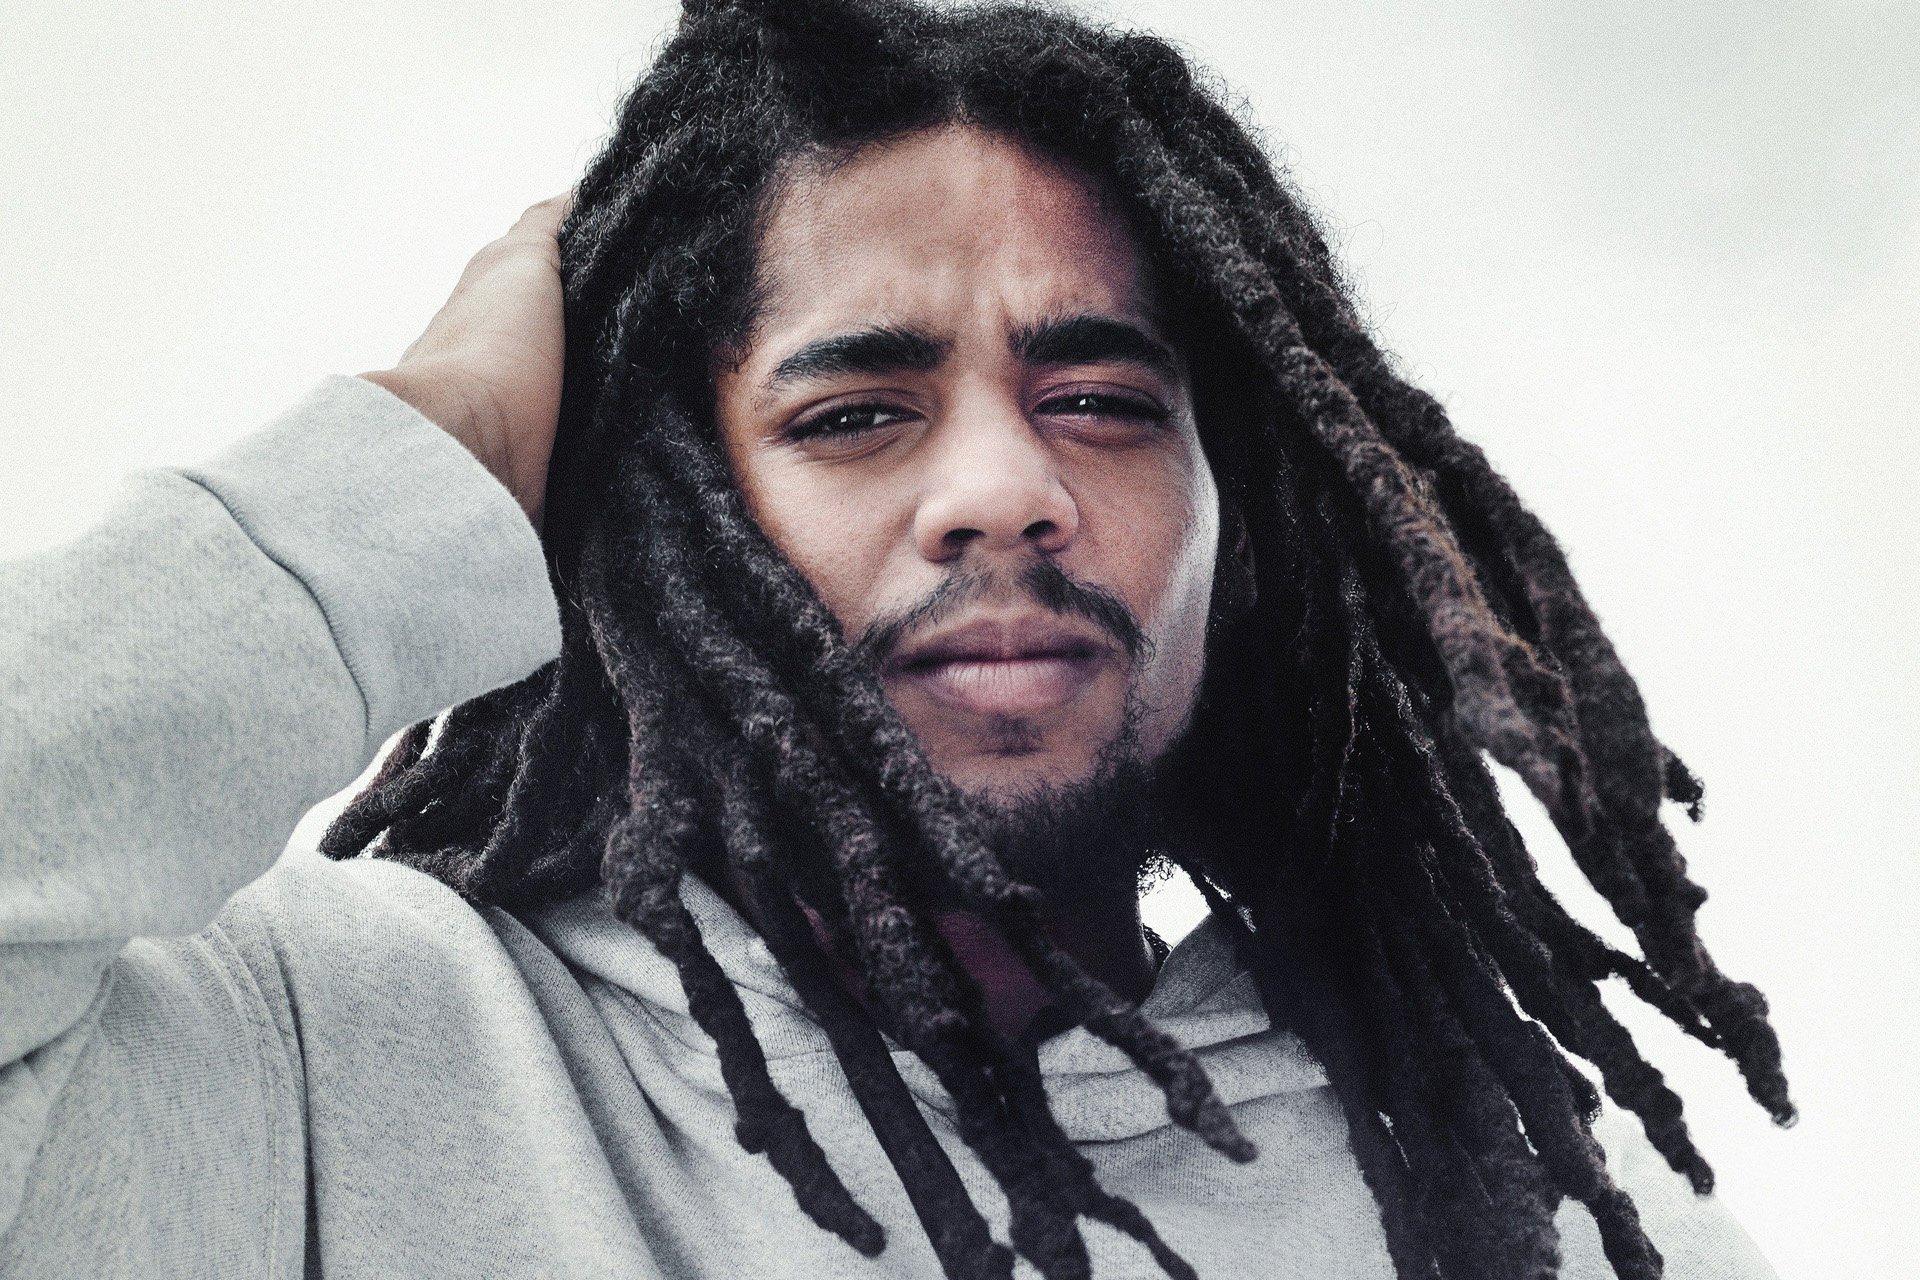 Skip Marley: Higher Place Album Review – DancehallMag